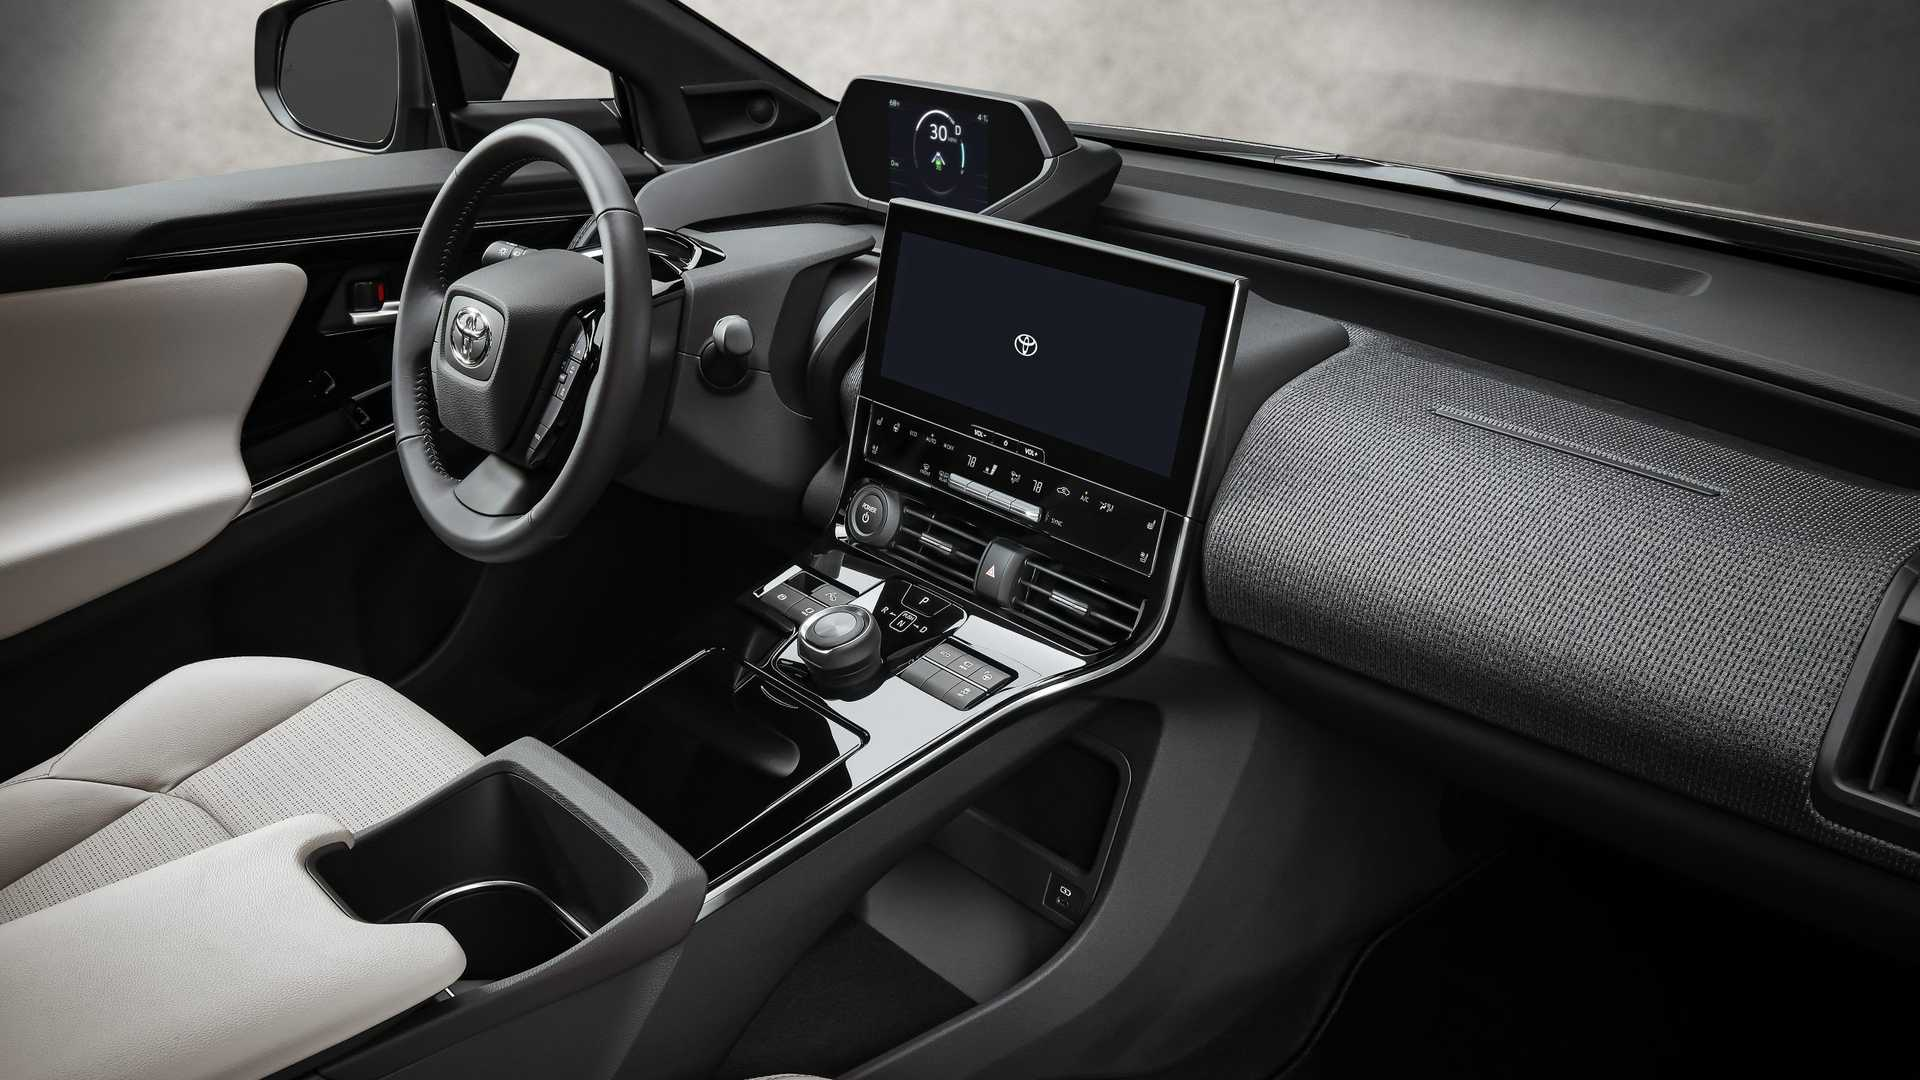 toyota-bz4x-north-american-debut-interior-angled.jpg